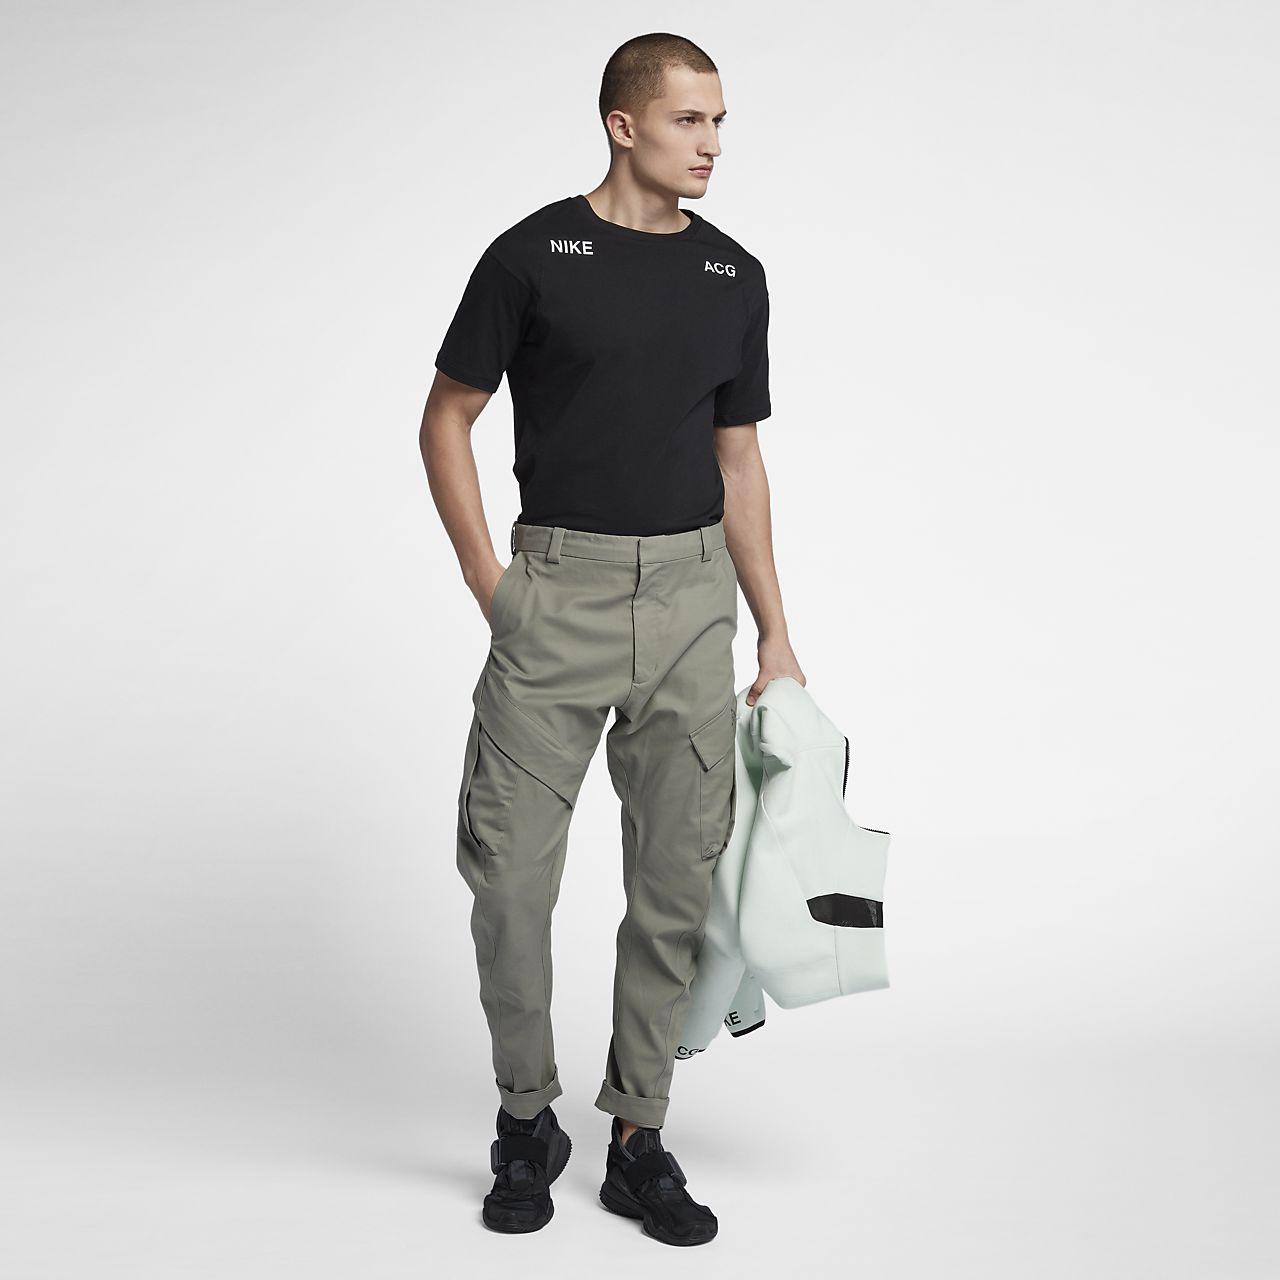 online retailer f0bf0 8d303 Men s Trousers. NikeLab ACG Cargo